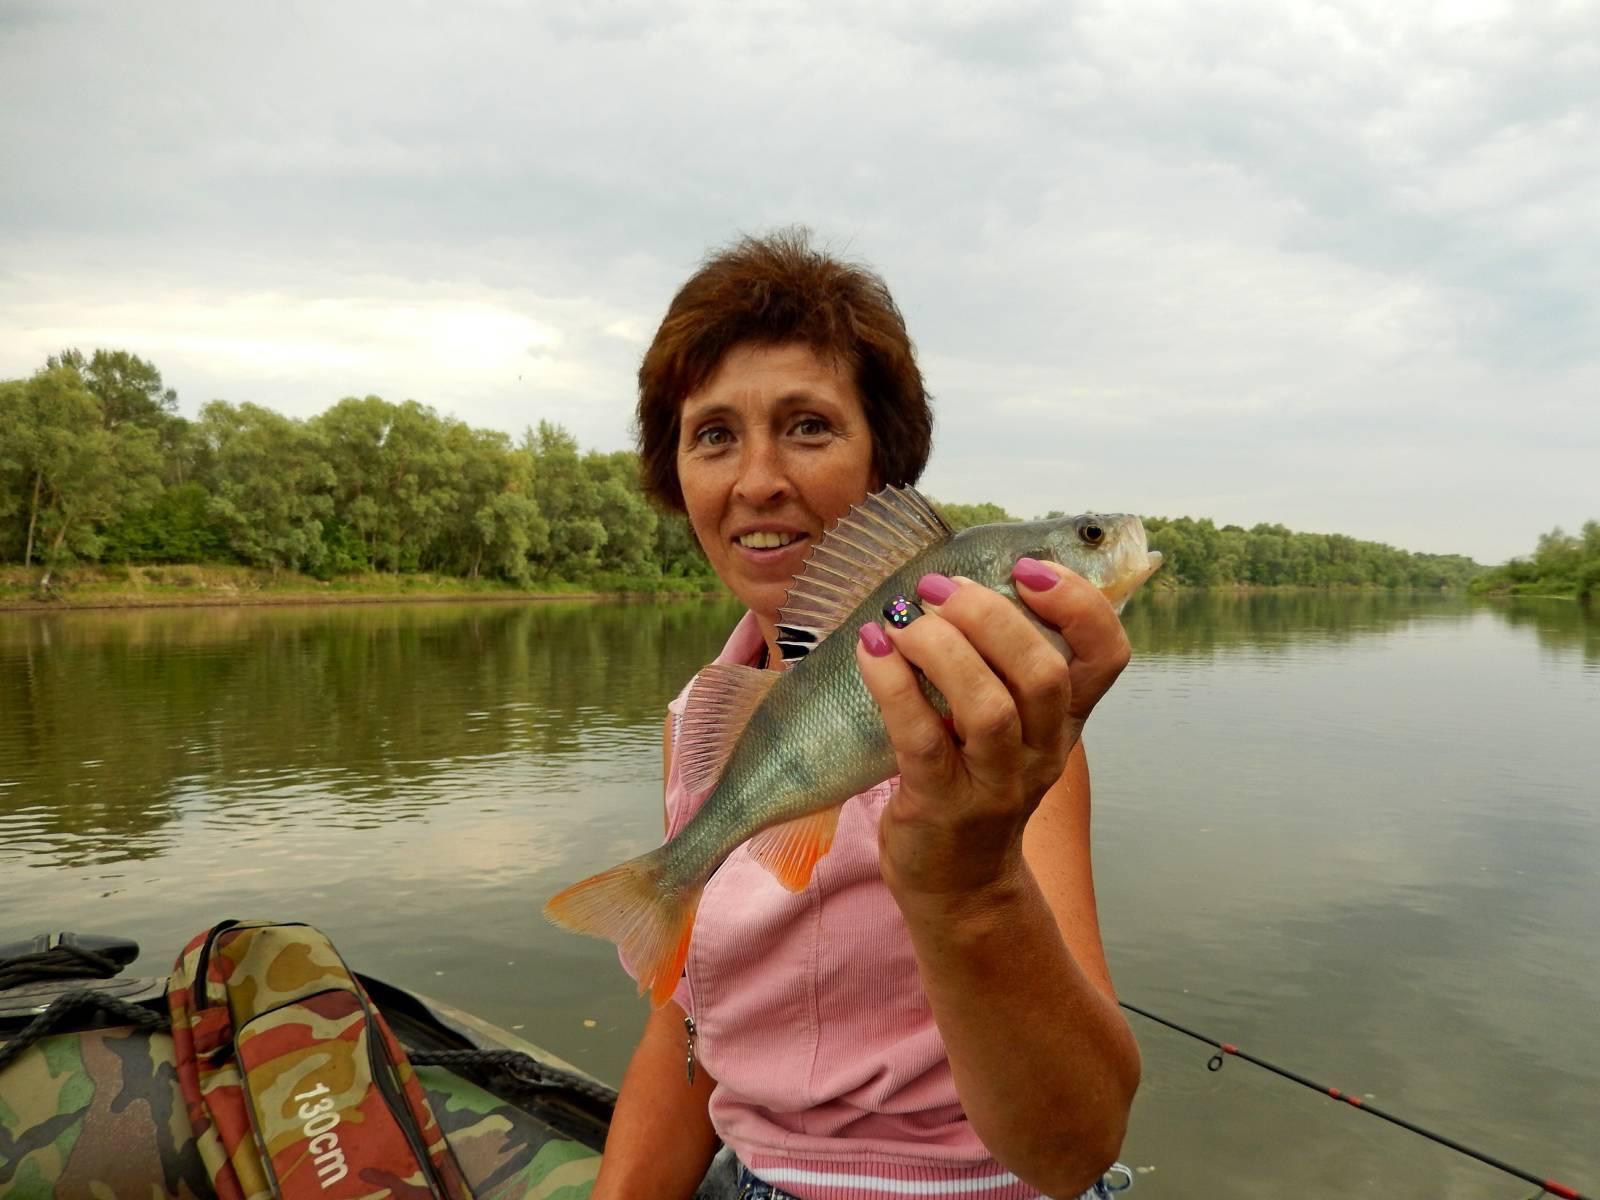 Рыбалка на хопре и ее особенности - на рыбалке!